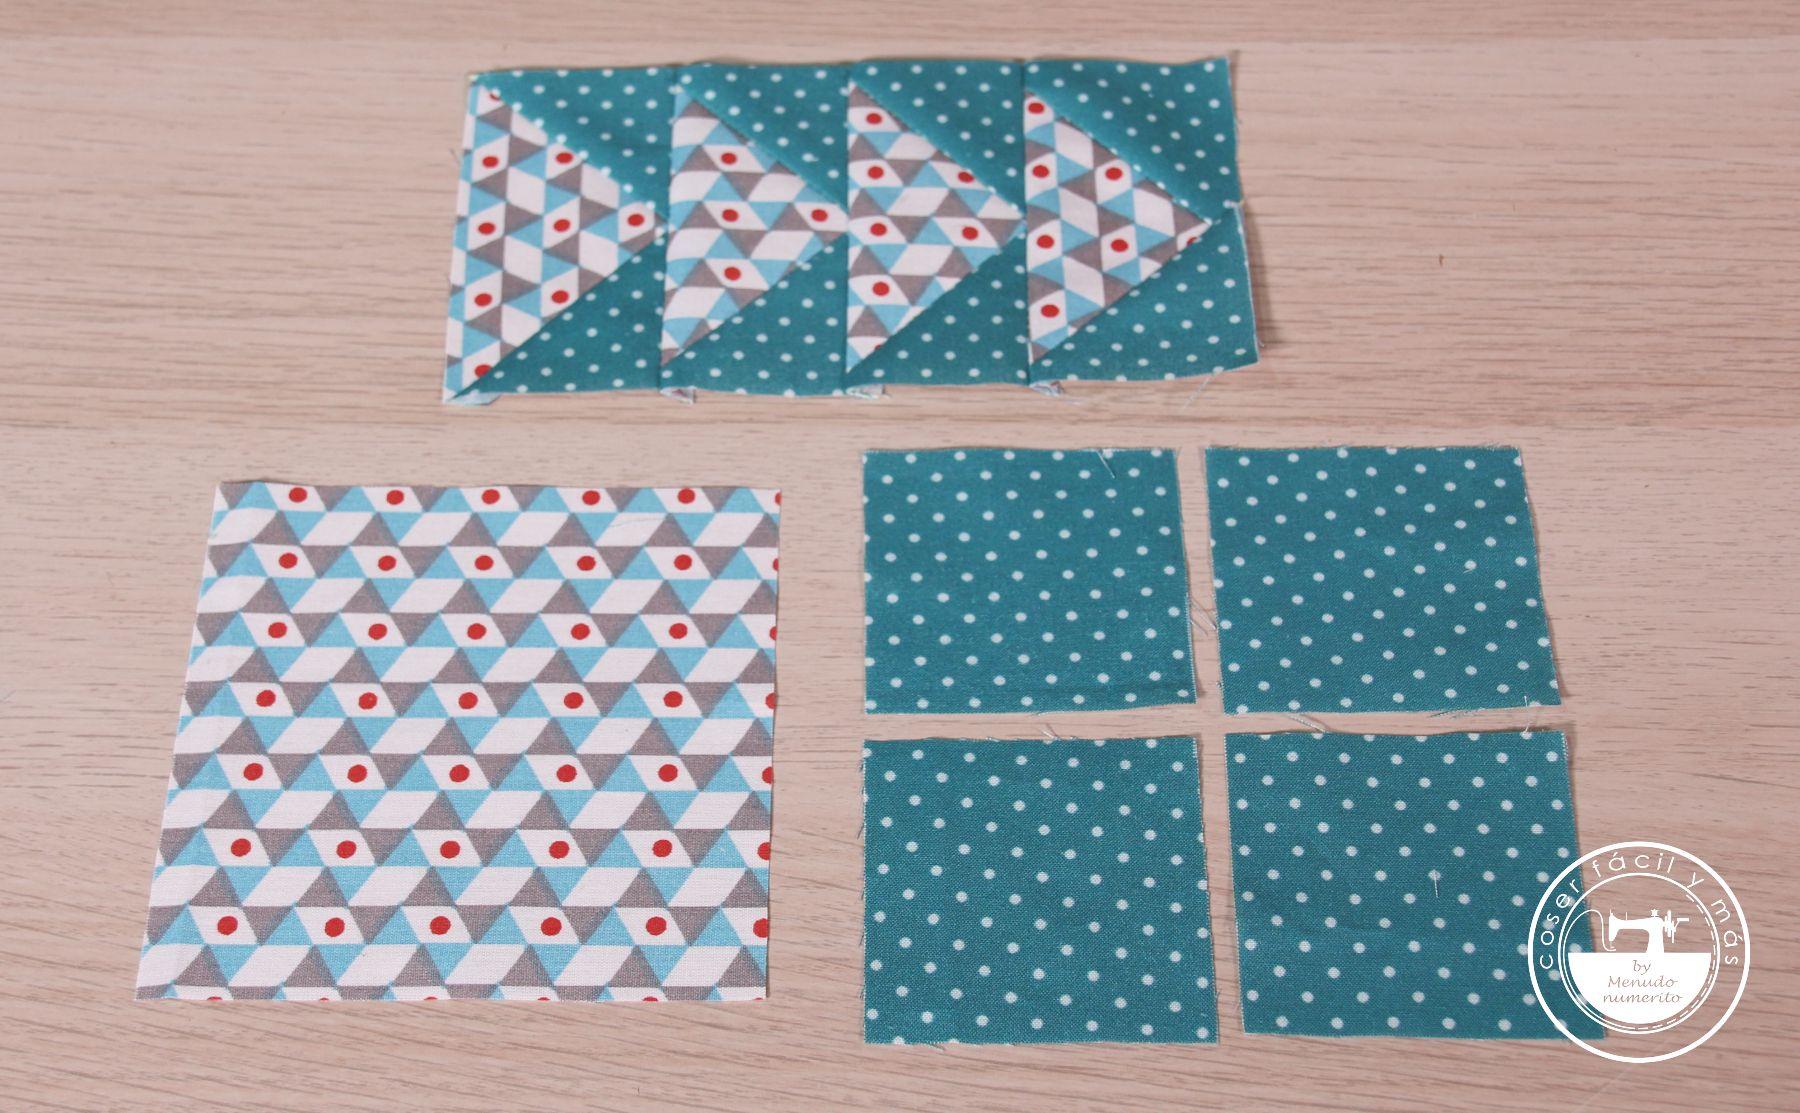 vuelo de la oca blogs de costura patchwork